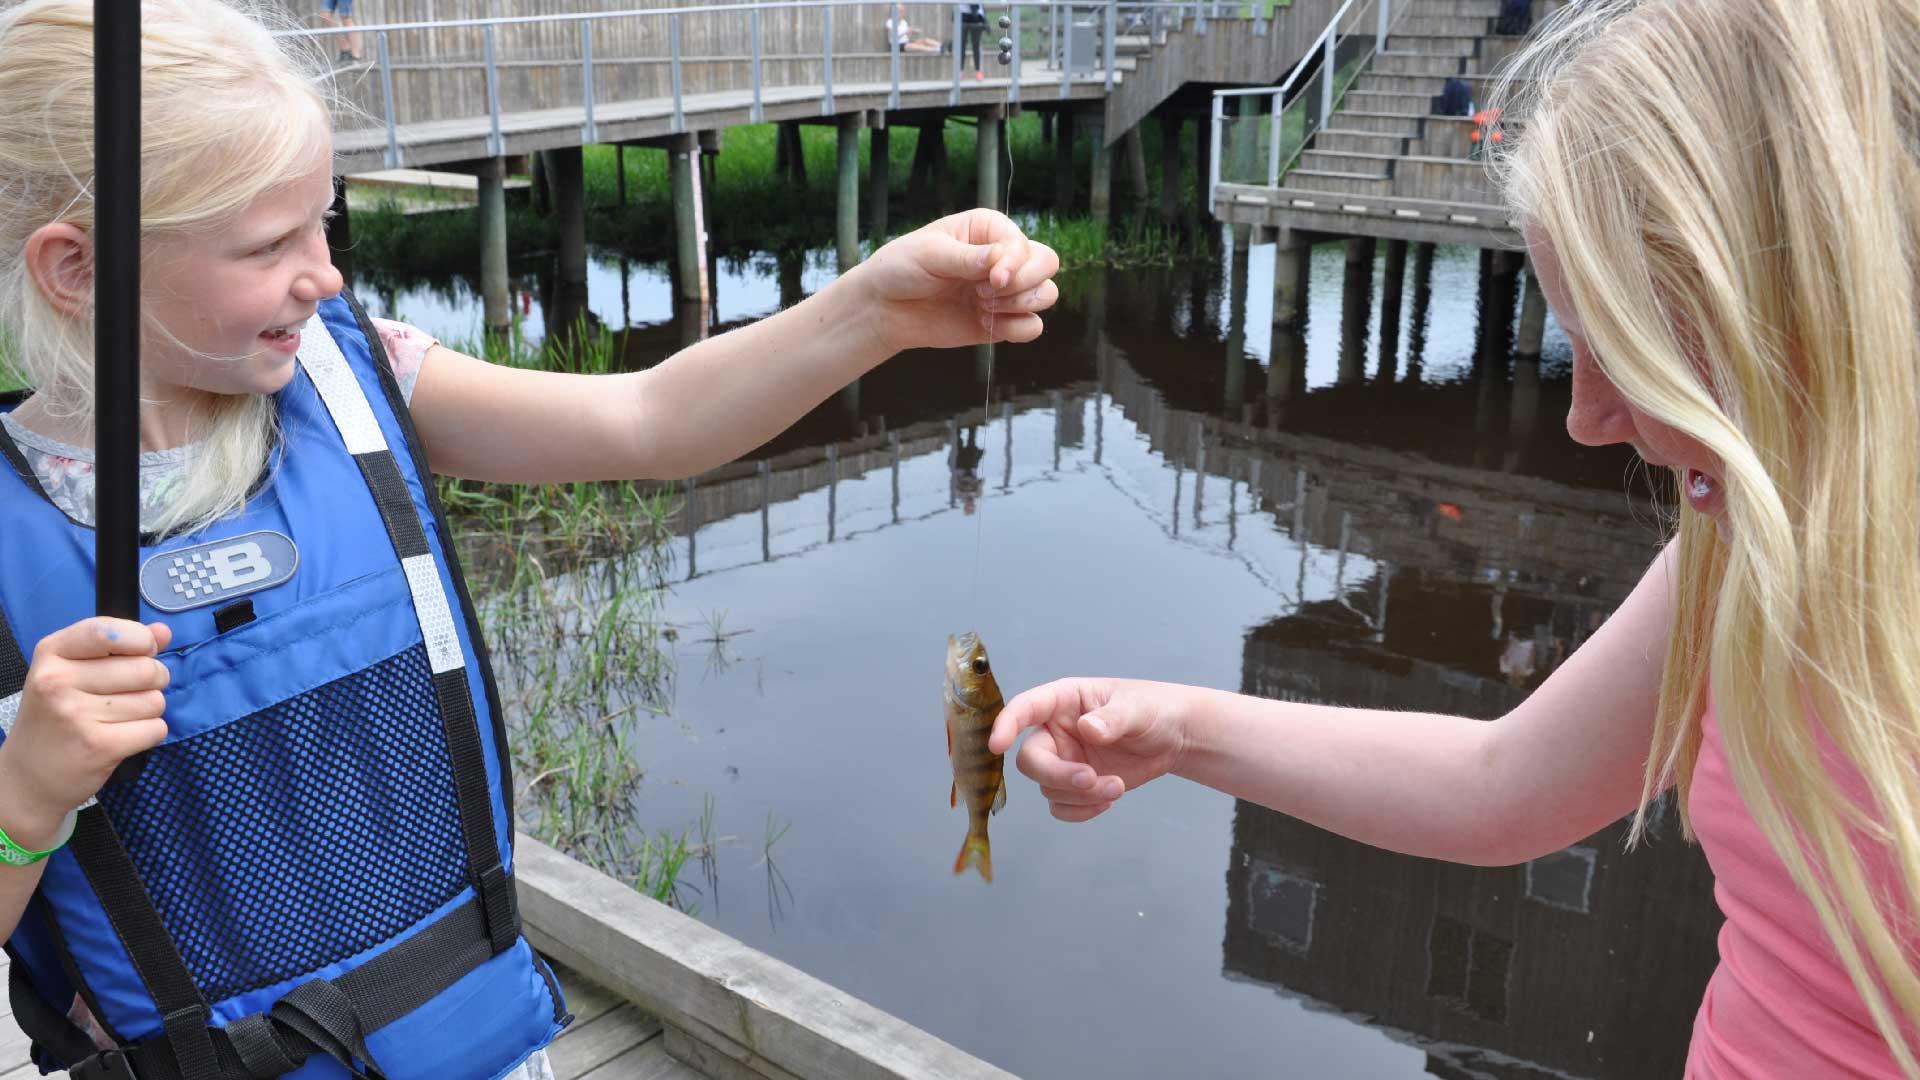 Barn får meta vid naturum Vattenriket. Foto: Åsa Pearce